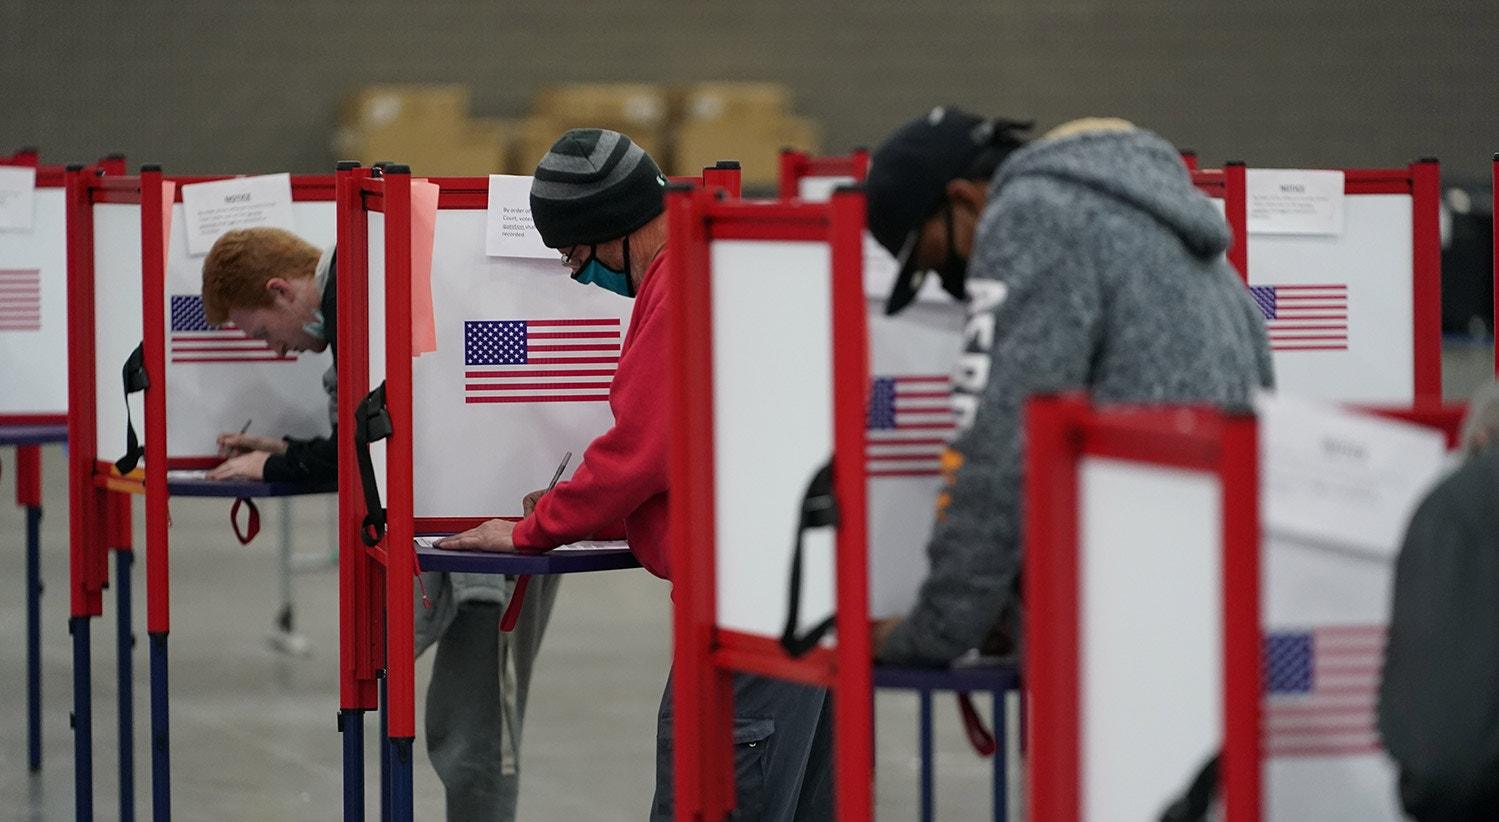 Os eleitores preenchem os boletins de voto no Kentucky | REUTERS/Bryan Woolston